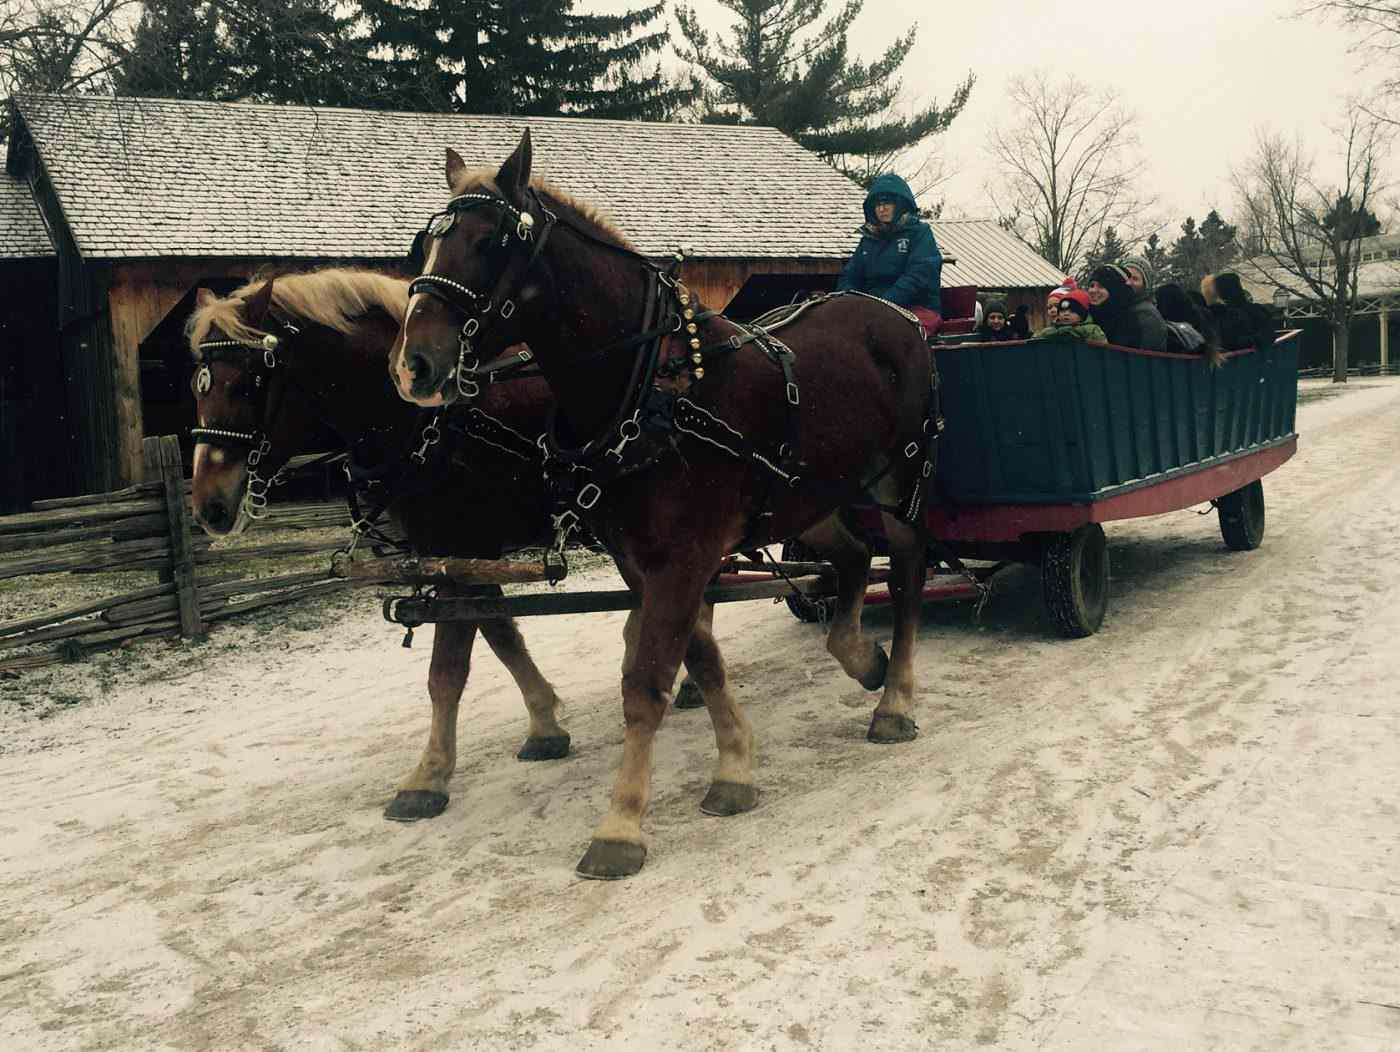 Horse drawn carriage ride at Black Creek Pioneer Village